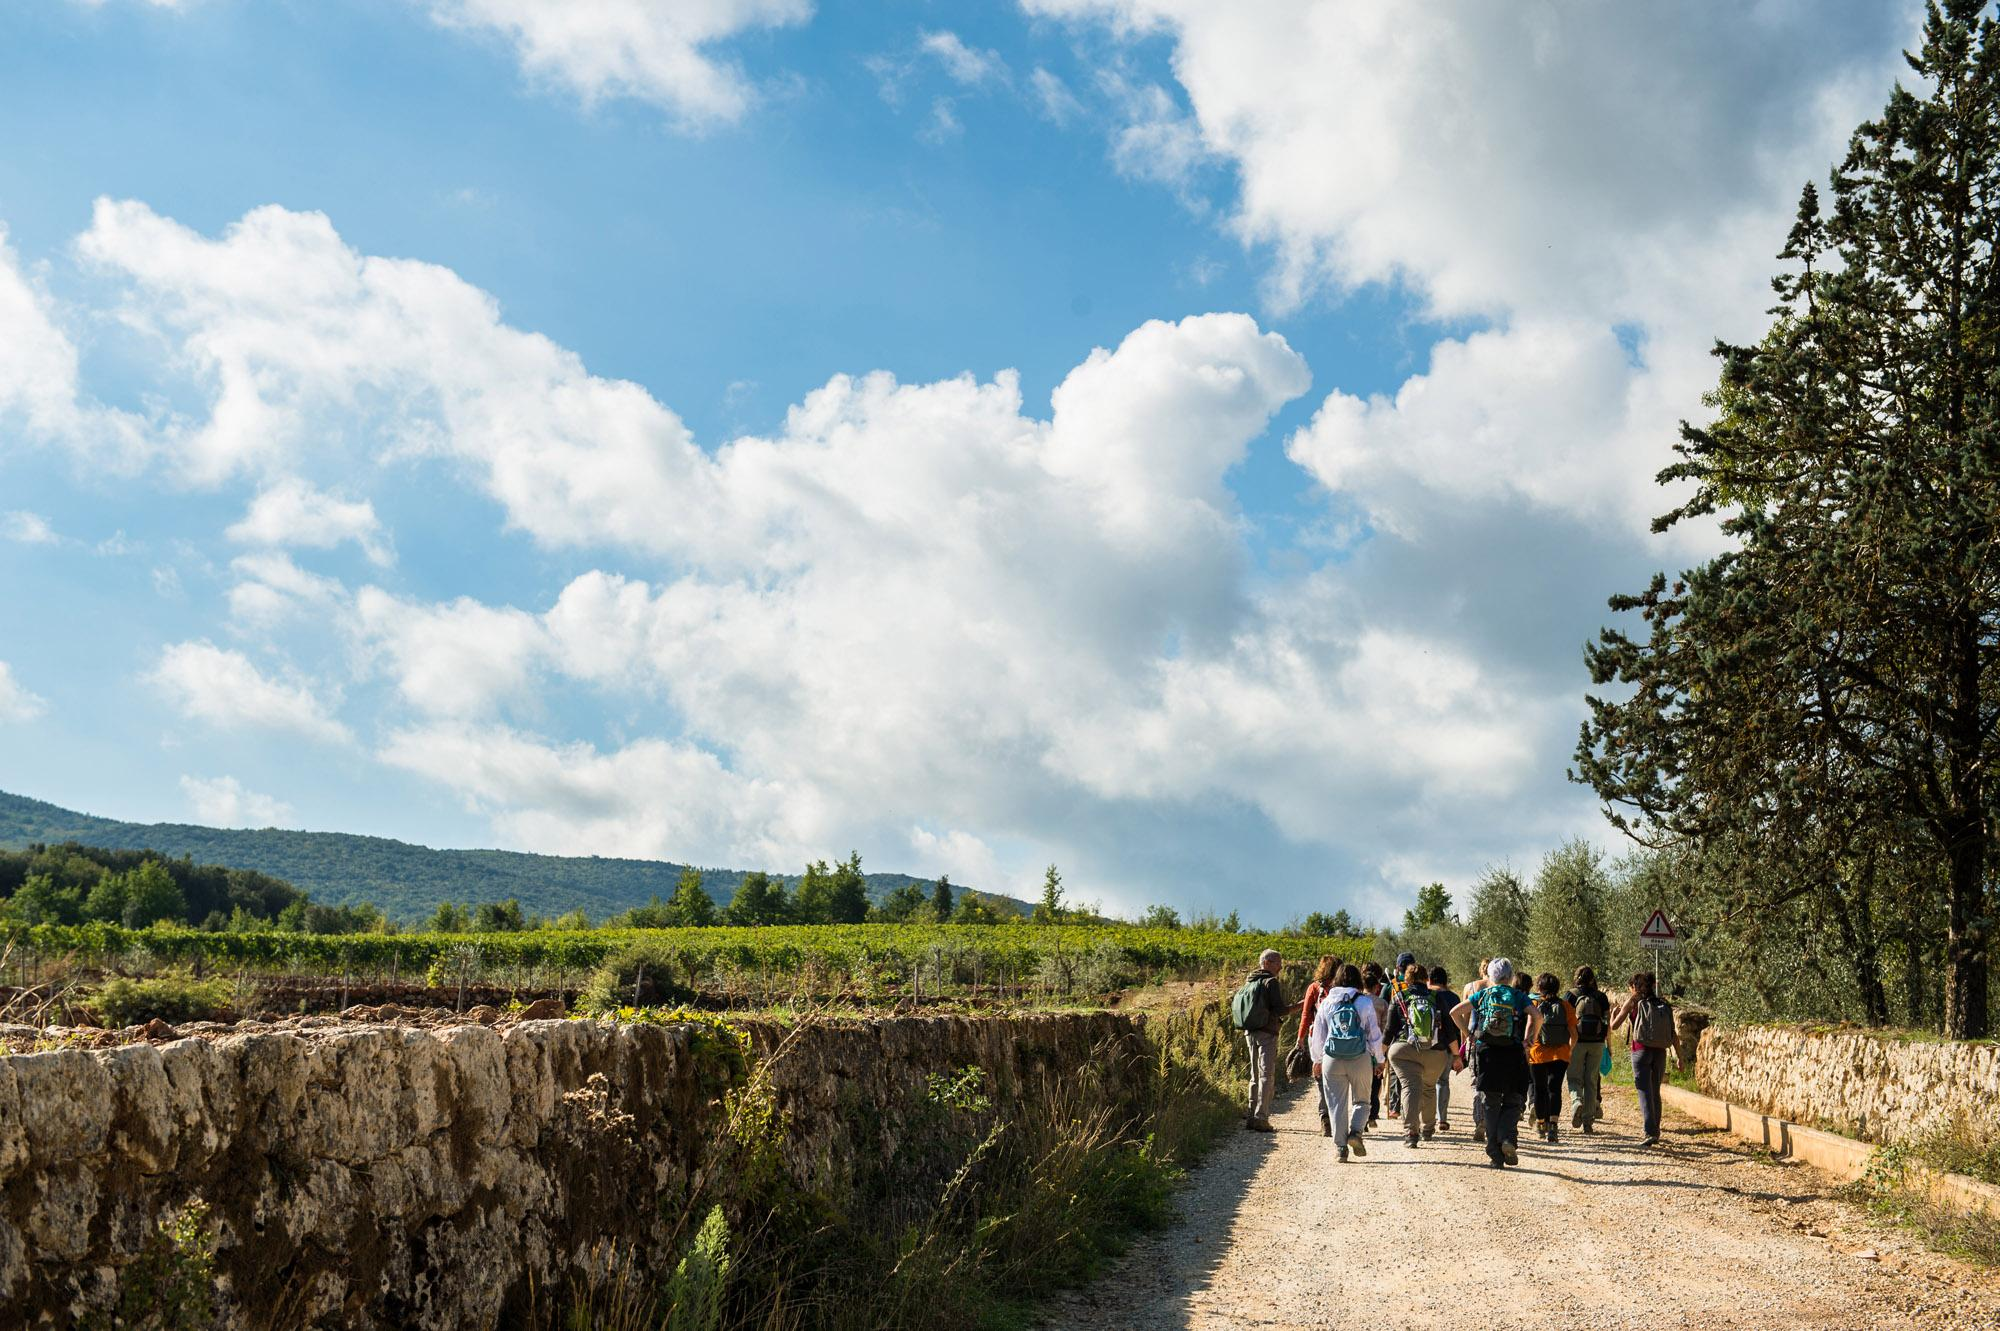 The Via Francigena—the famous pilgrim road to Rome—from San Gimignano to Monteriggioni. – © Yari Ghidone / Slow travel Fest